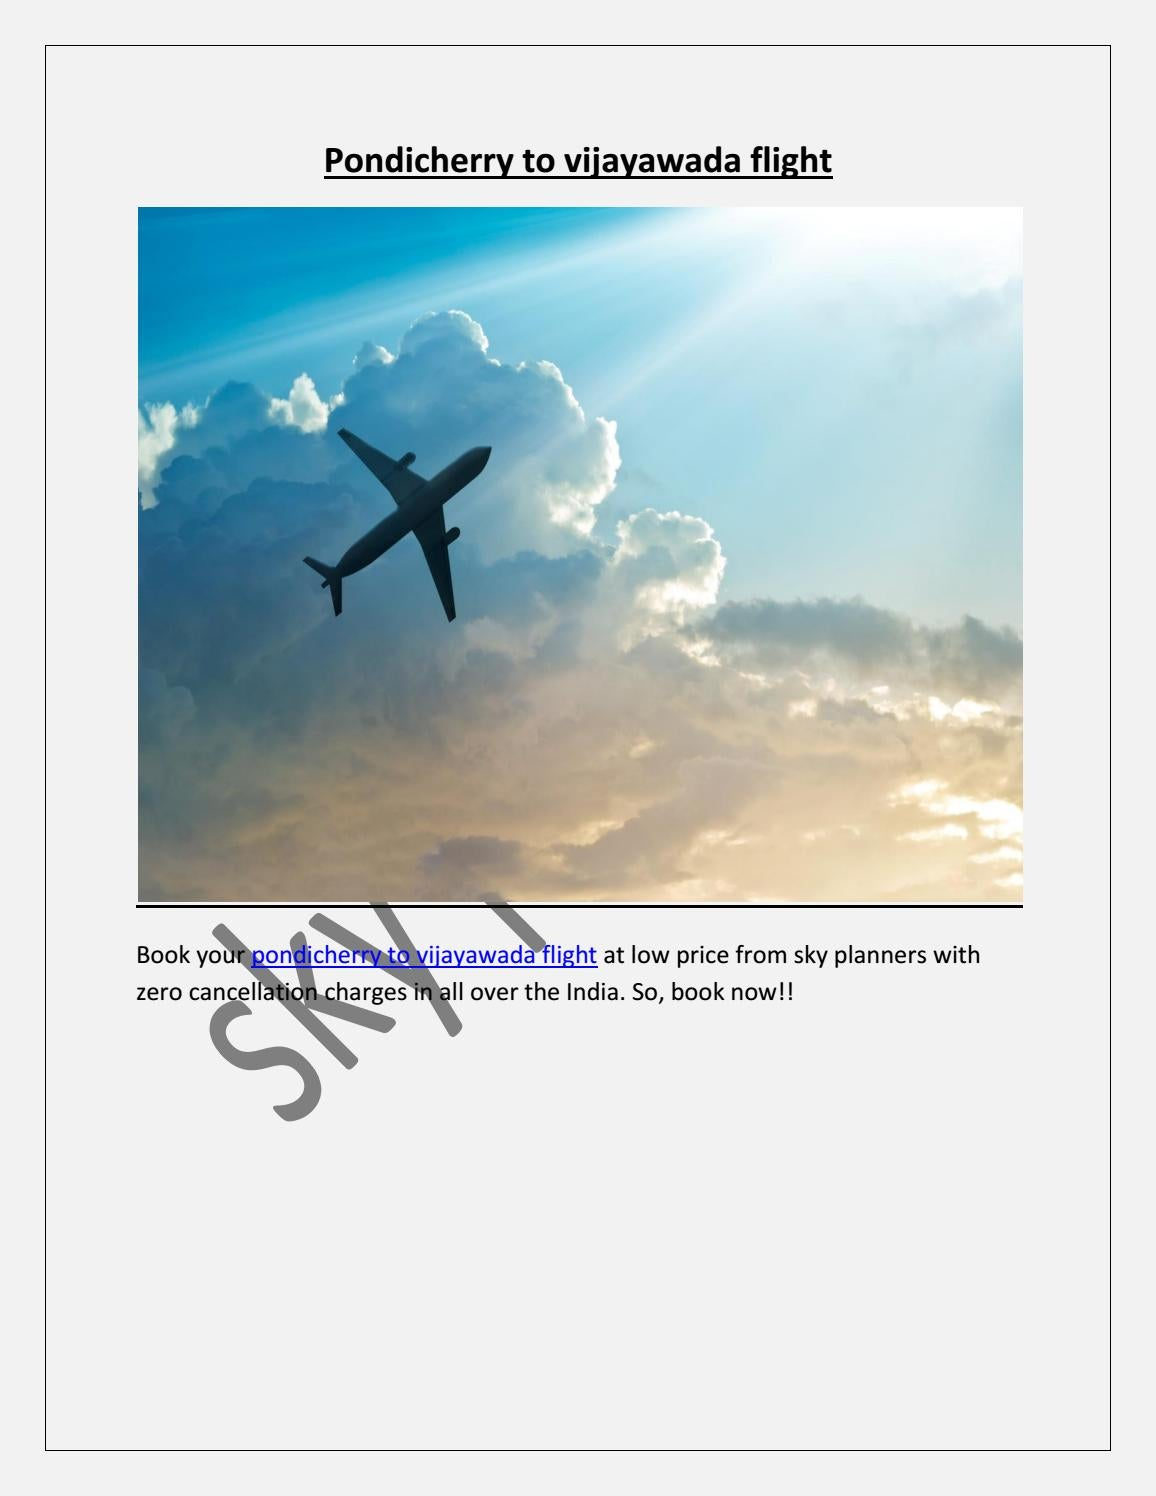 Pondicherry to vijayawada flight by skyplanners - issuu